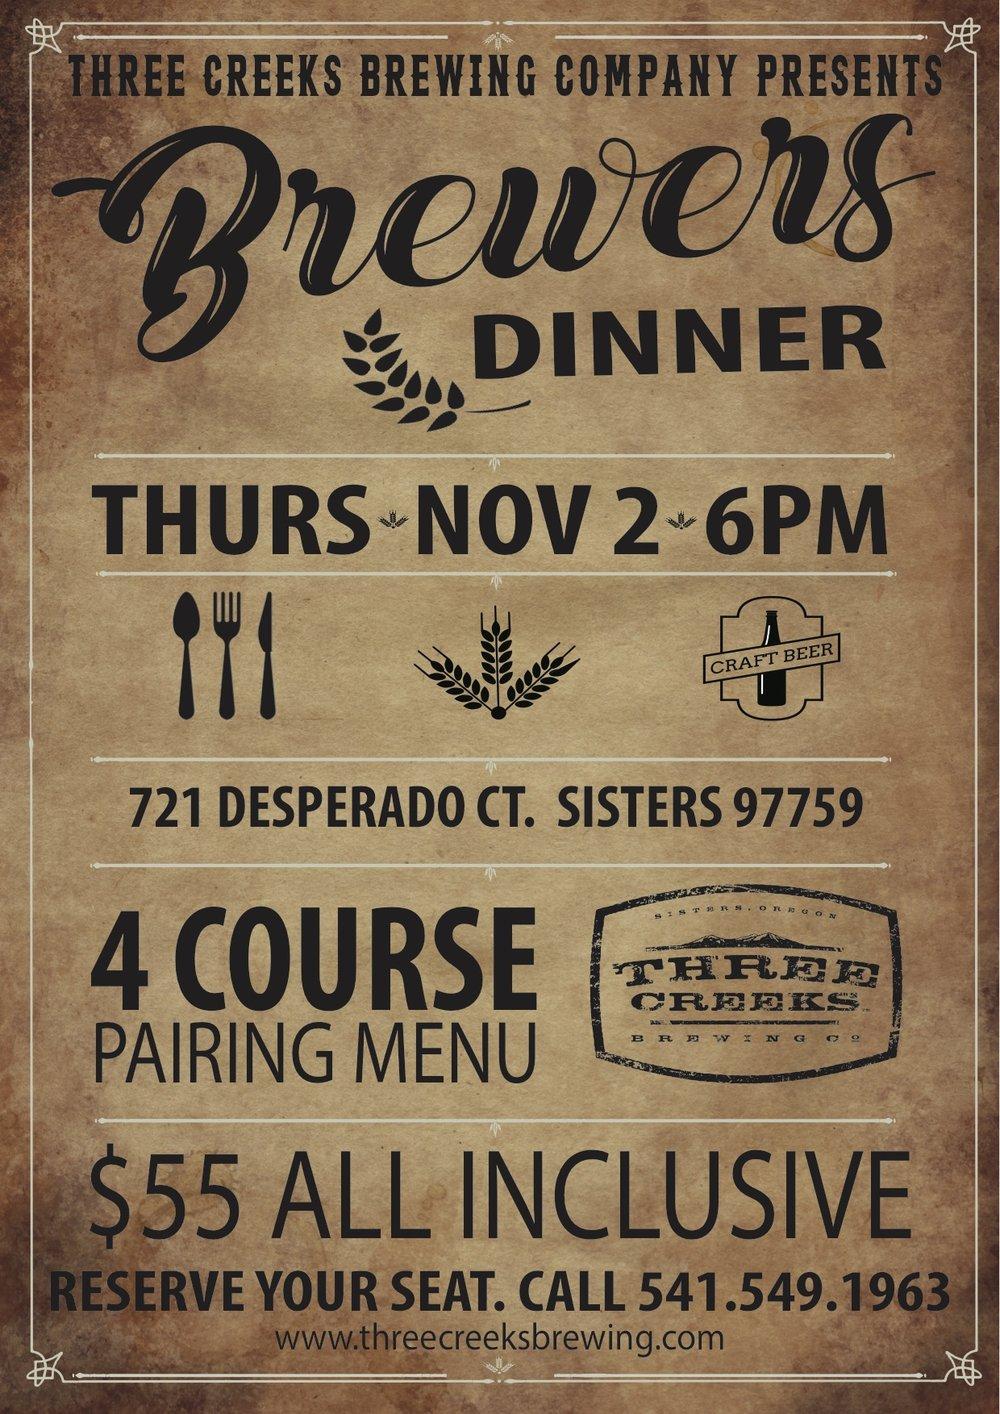 Brewers Dinner Poster 12.jpg